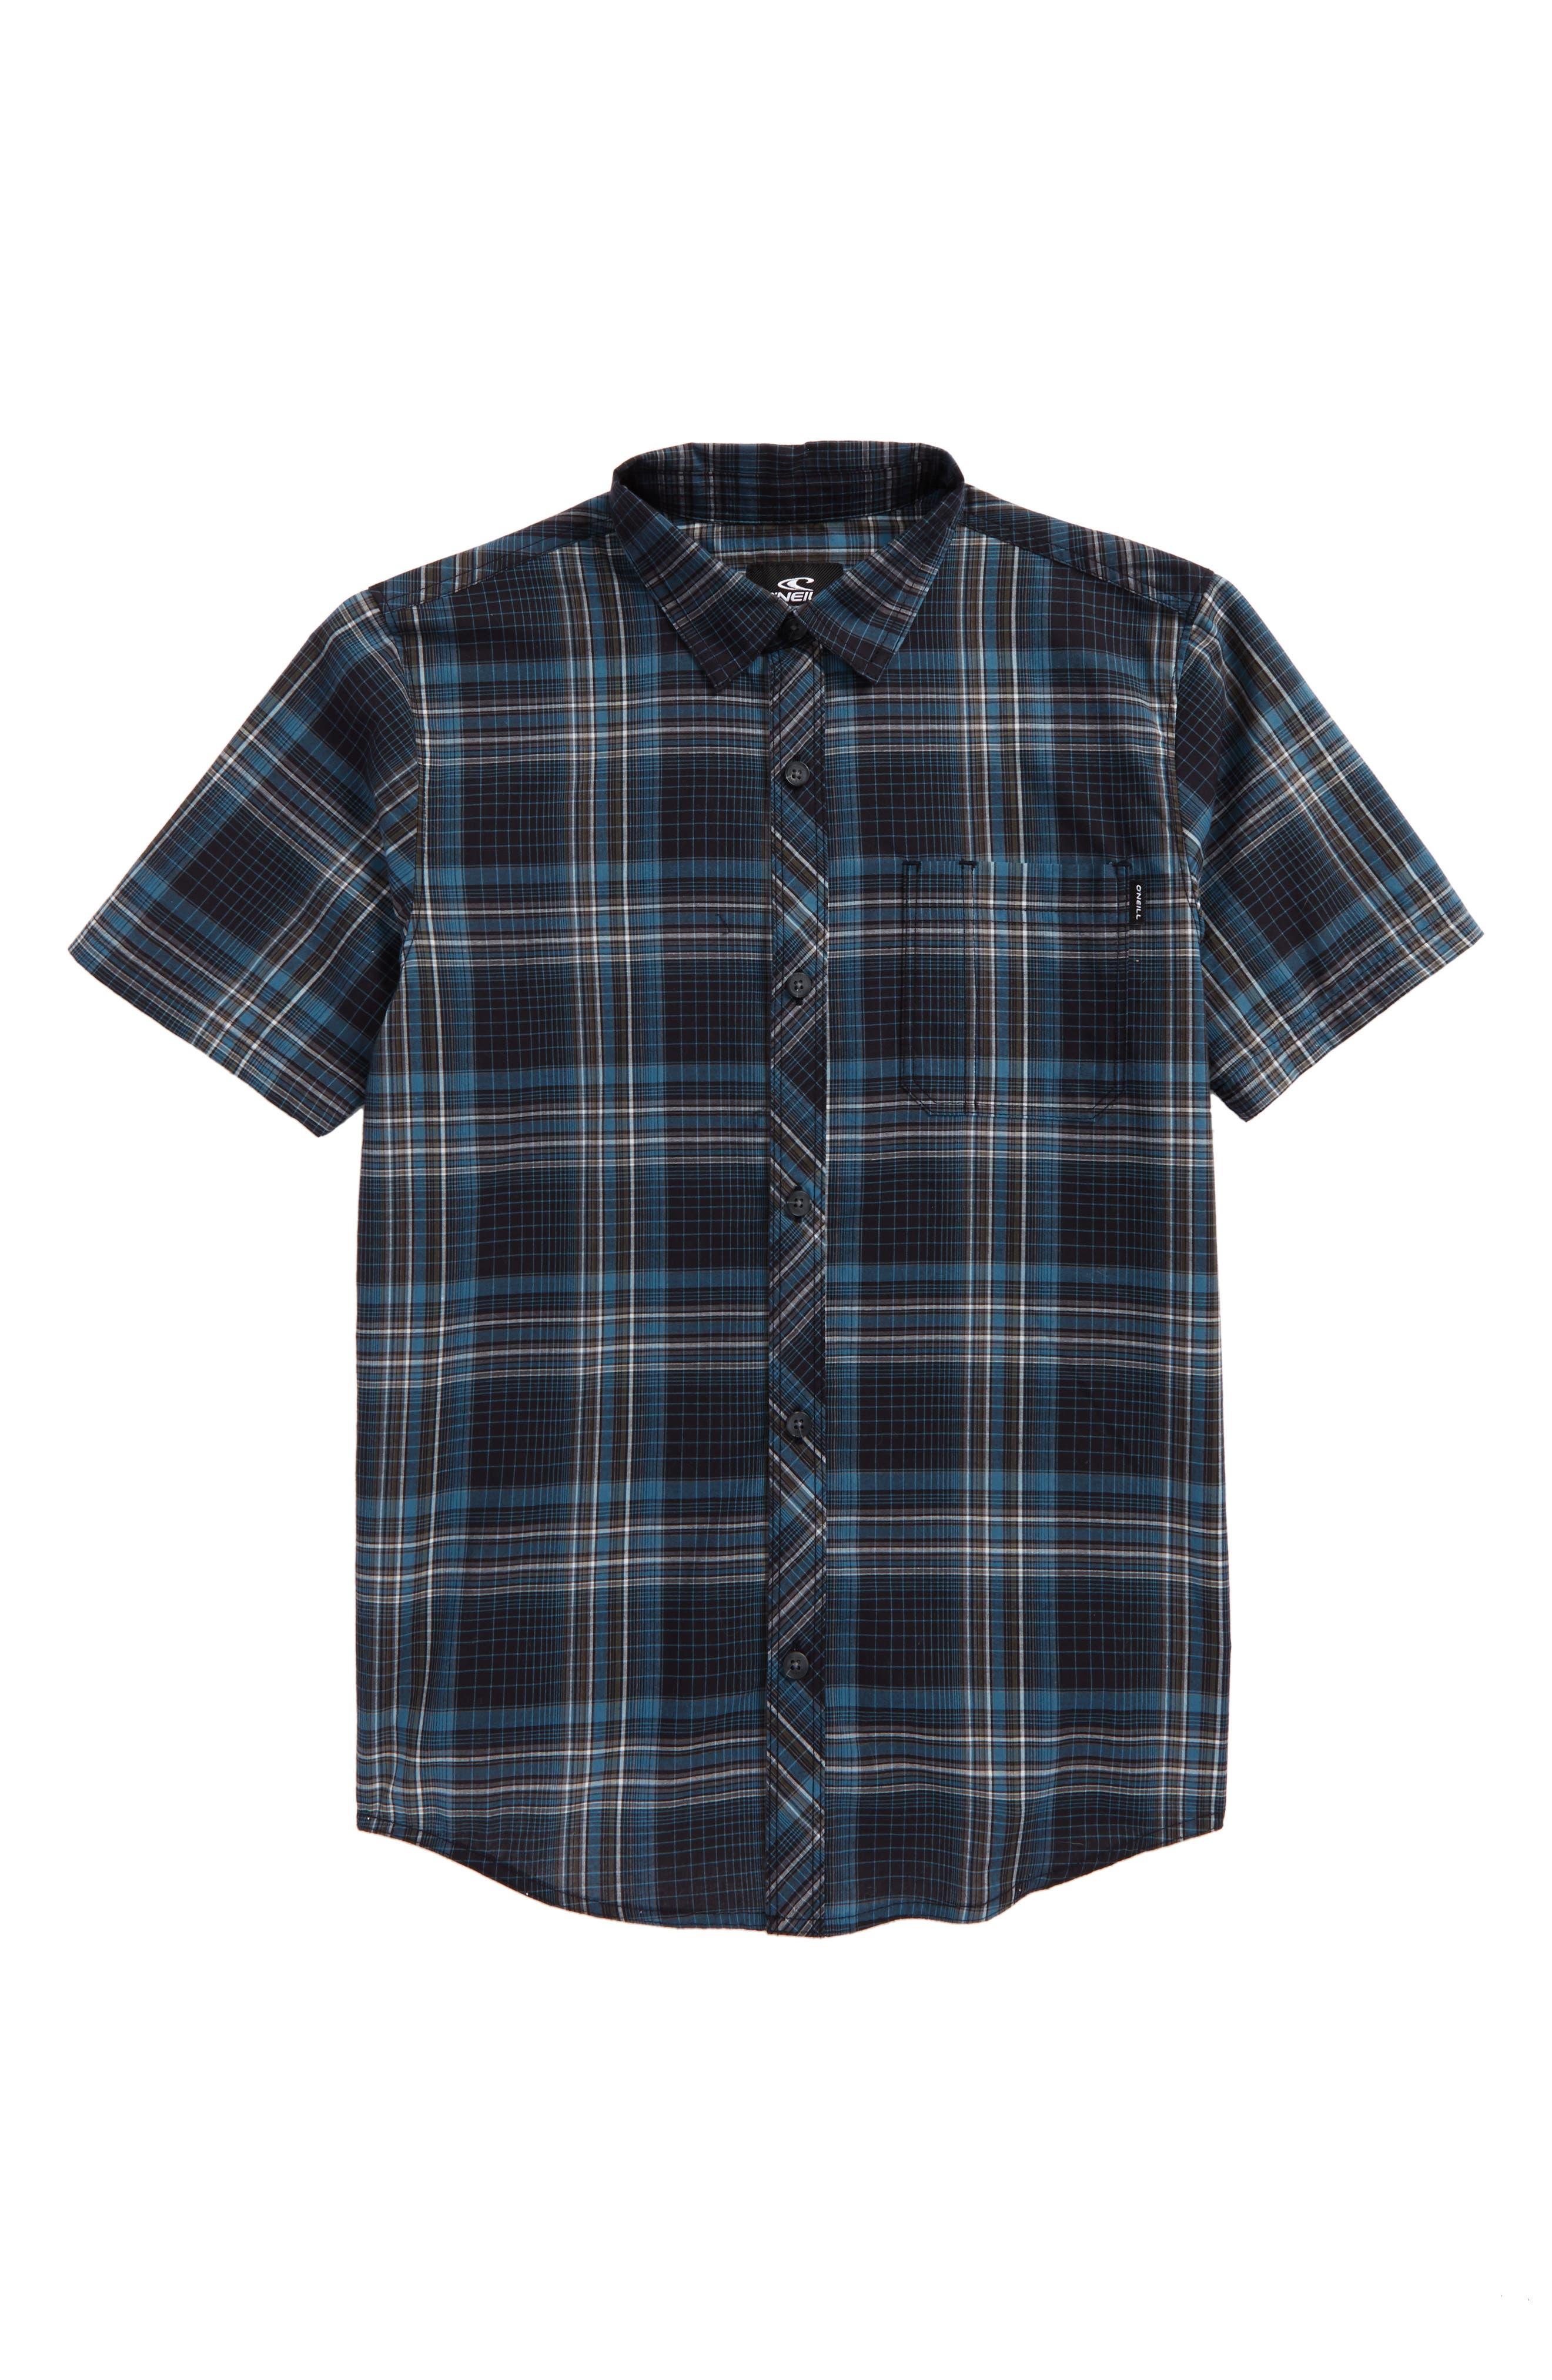 Sturghill Plaid Woven Shirt,                         Main,                         color, Dark Navy